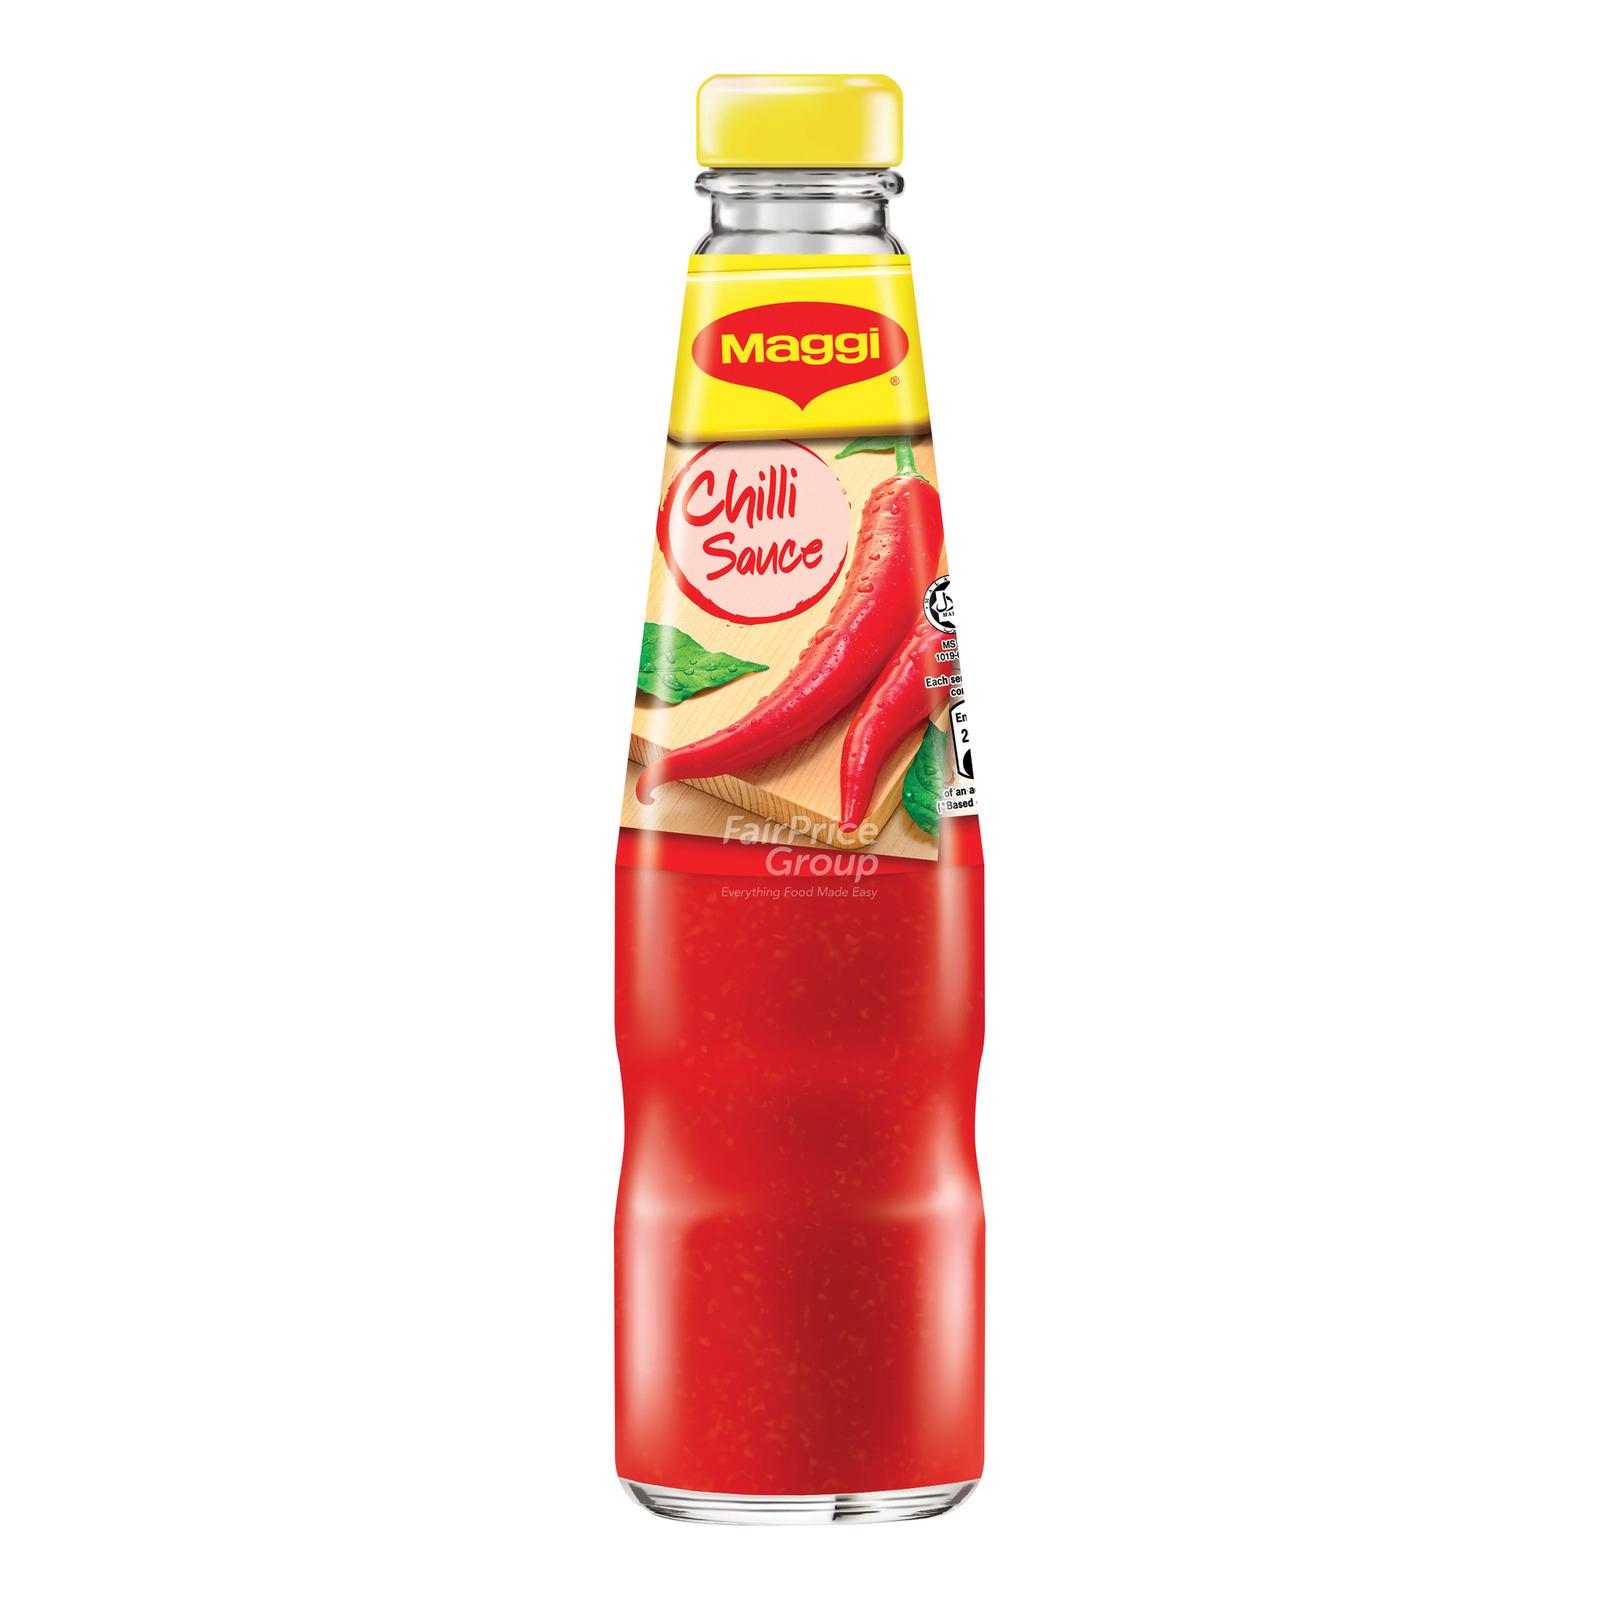 Maggi Chili Sauce